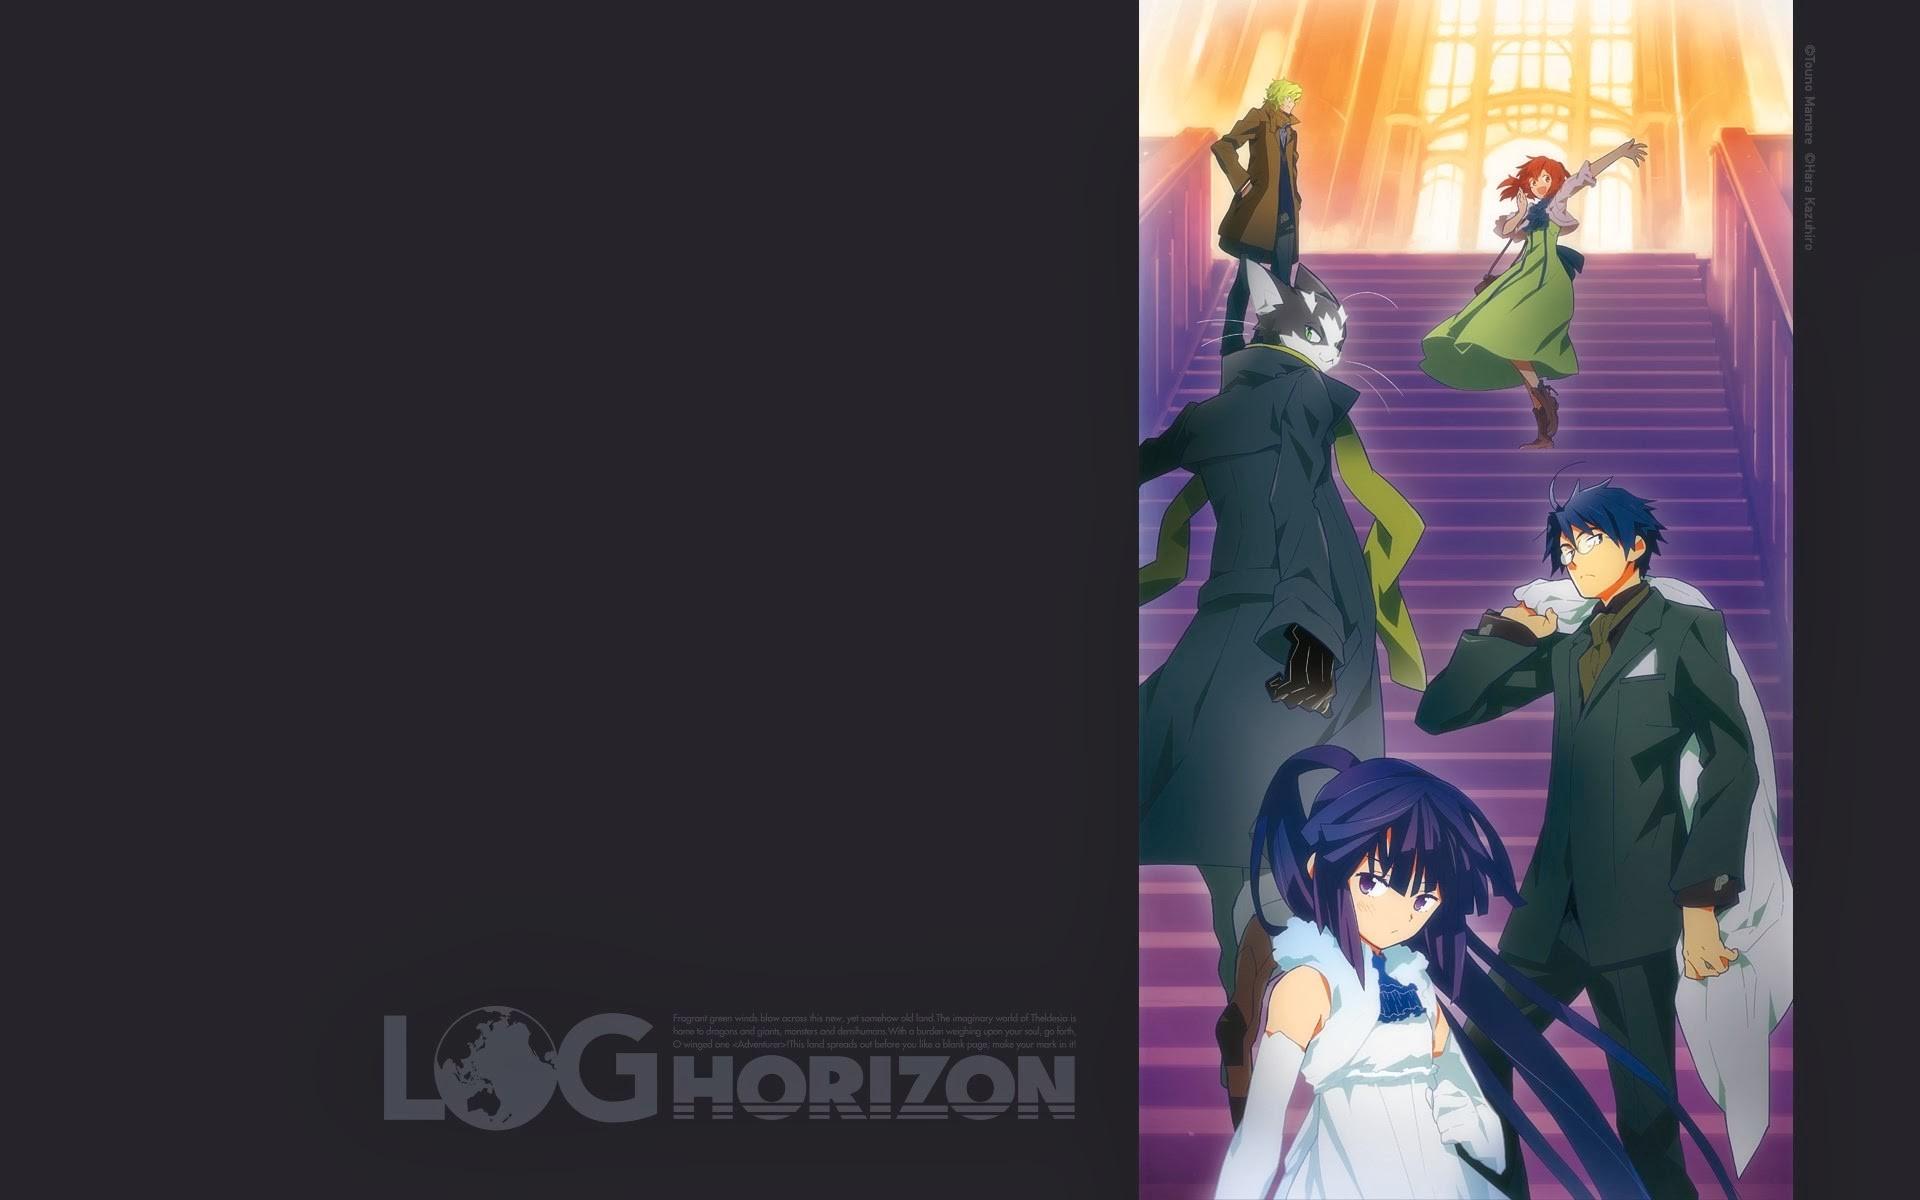 log horizon shiroe akatsuki nyanta anime hd wallpaper 1920×1200